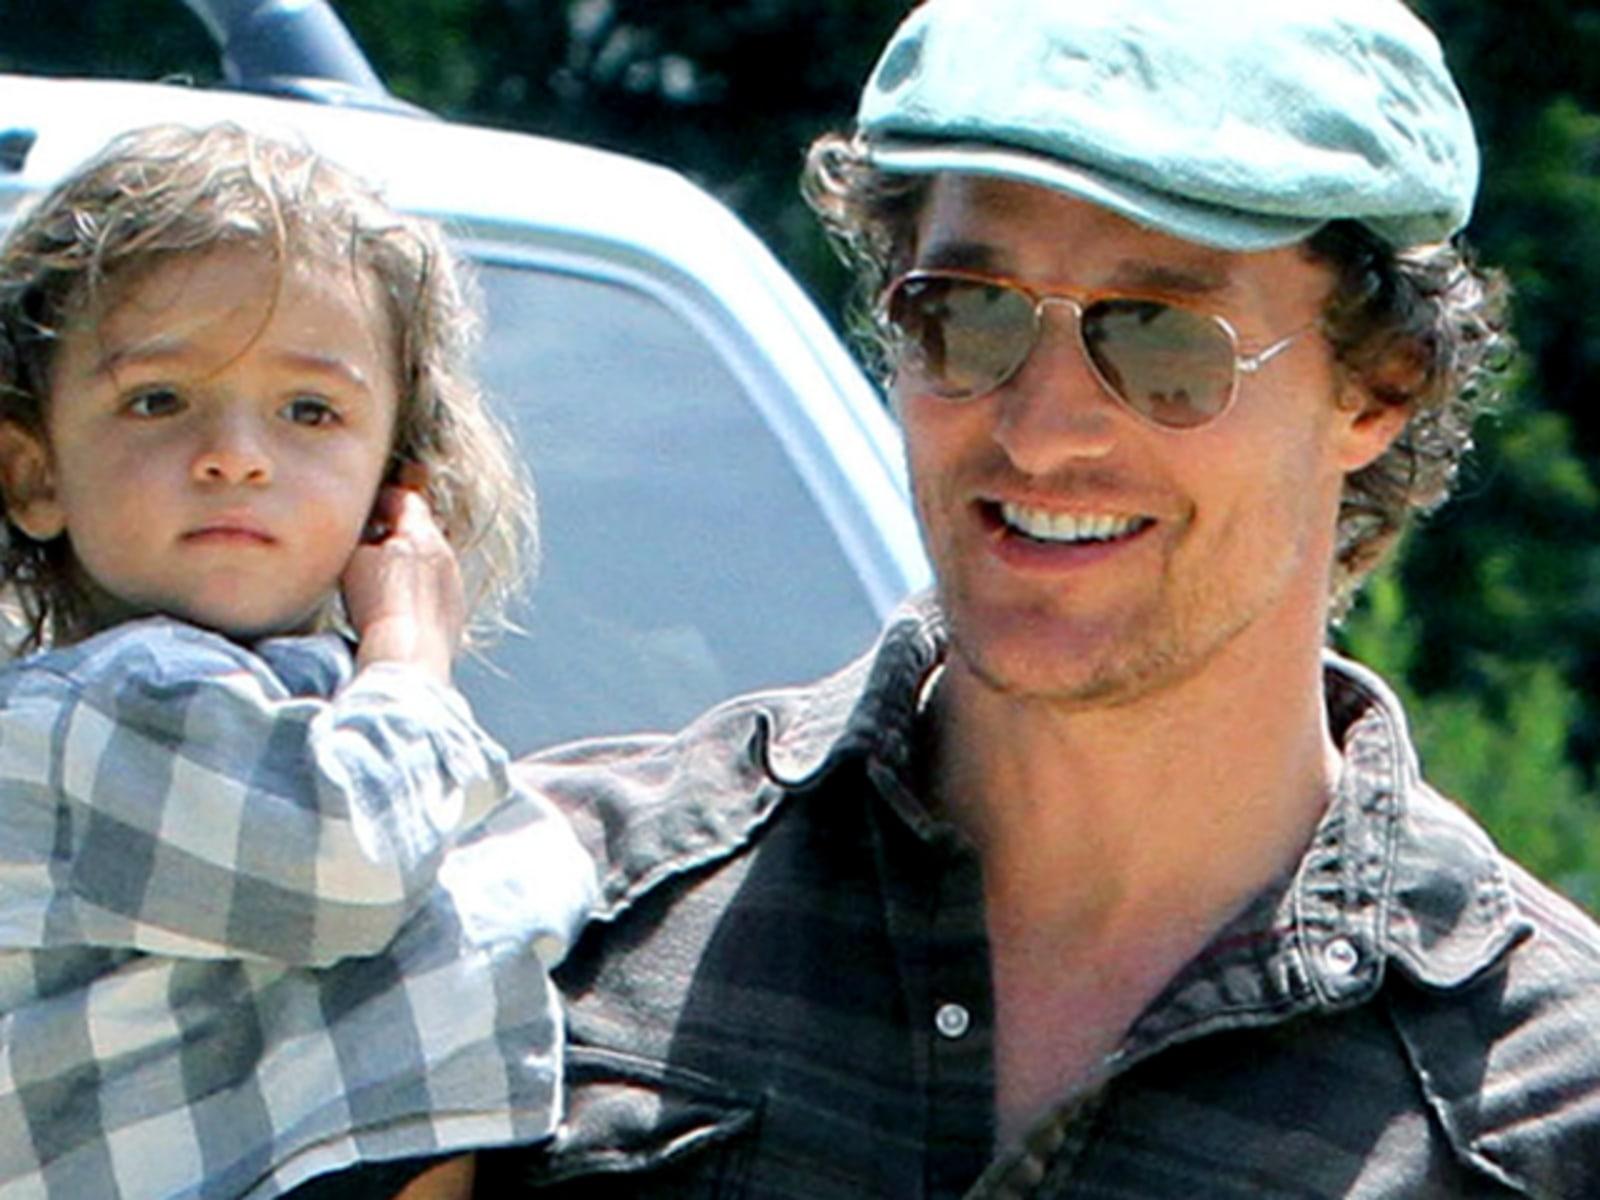 Image: Matthew McConaughey and McConaughey